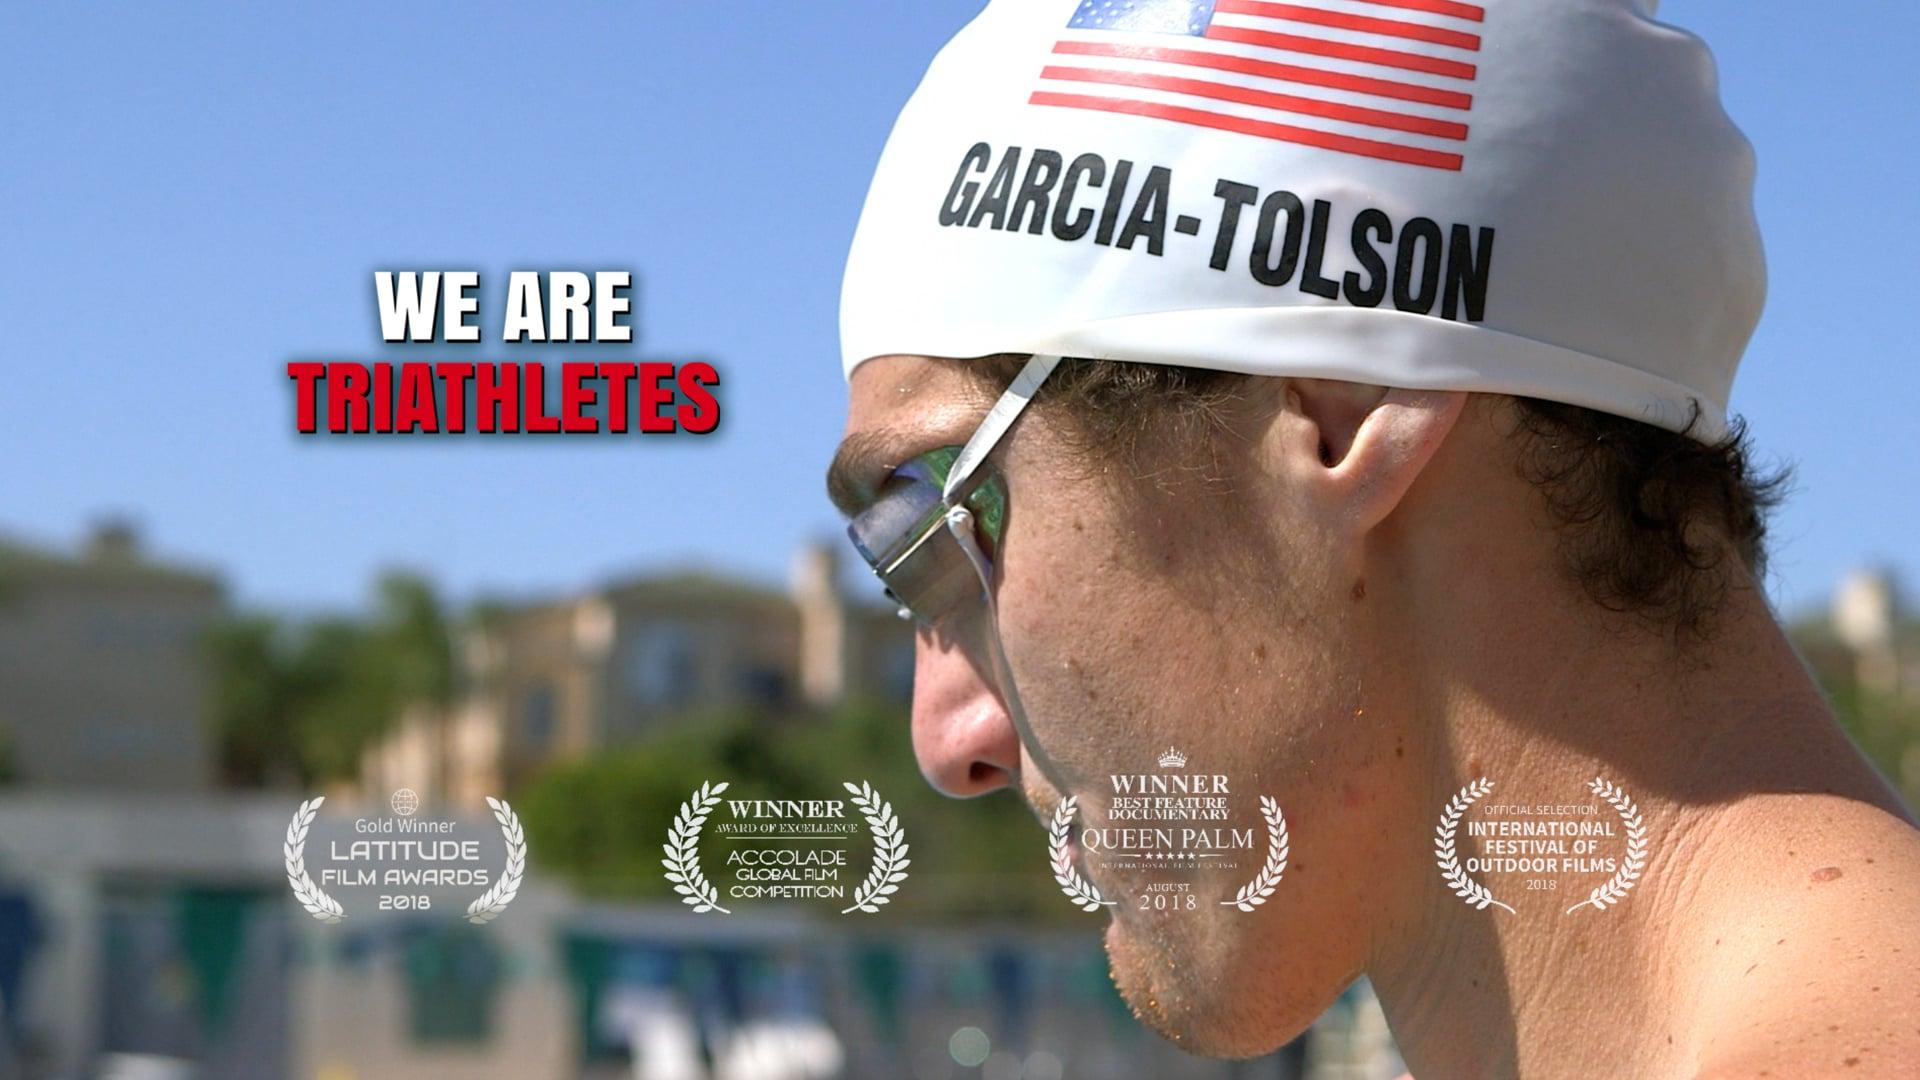 We Are Triathletes Full Trailer (DVD & Digital Release)